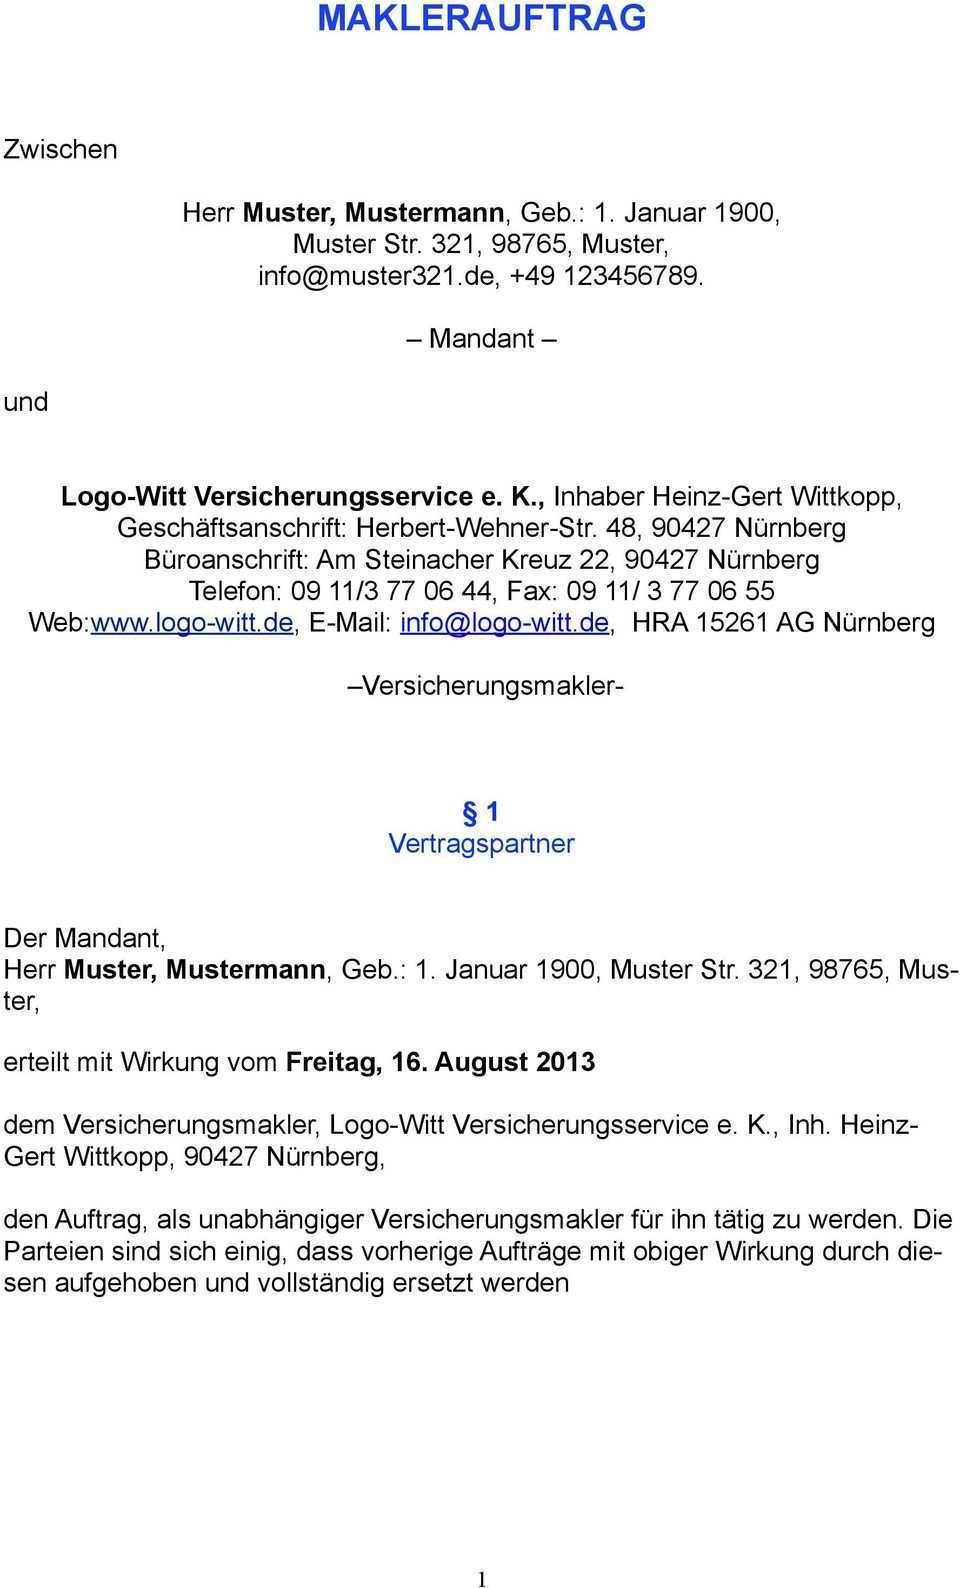 Maklerauftrag Herr Muster Mustermann Geb 1 Januar 1900 Muster Str 321 98765 Muster Pdf Free Download